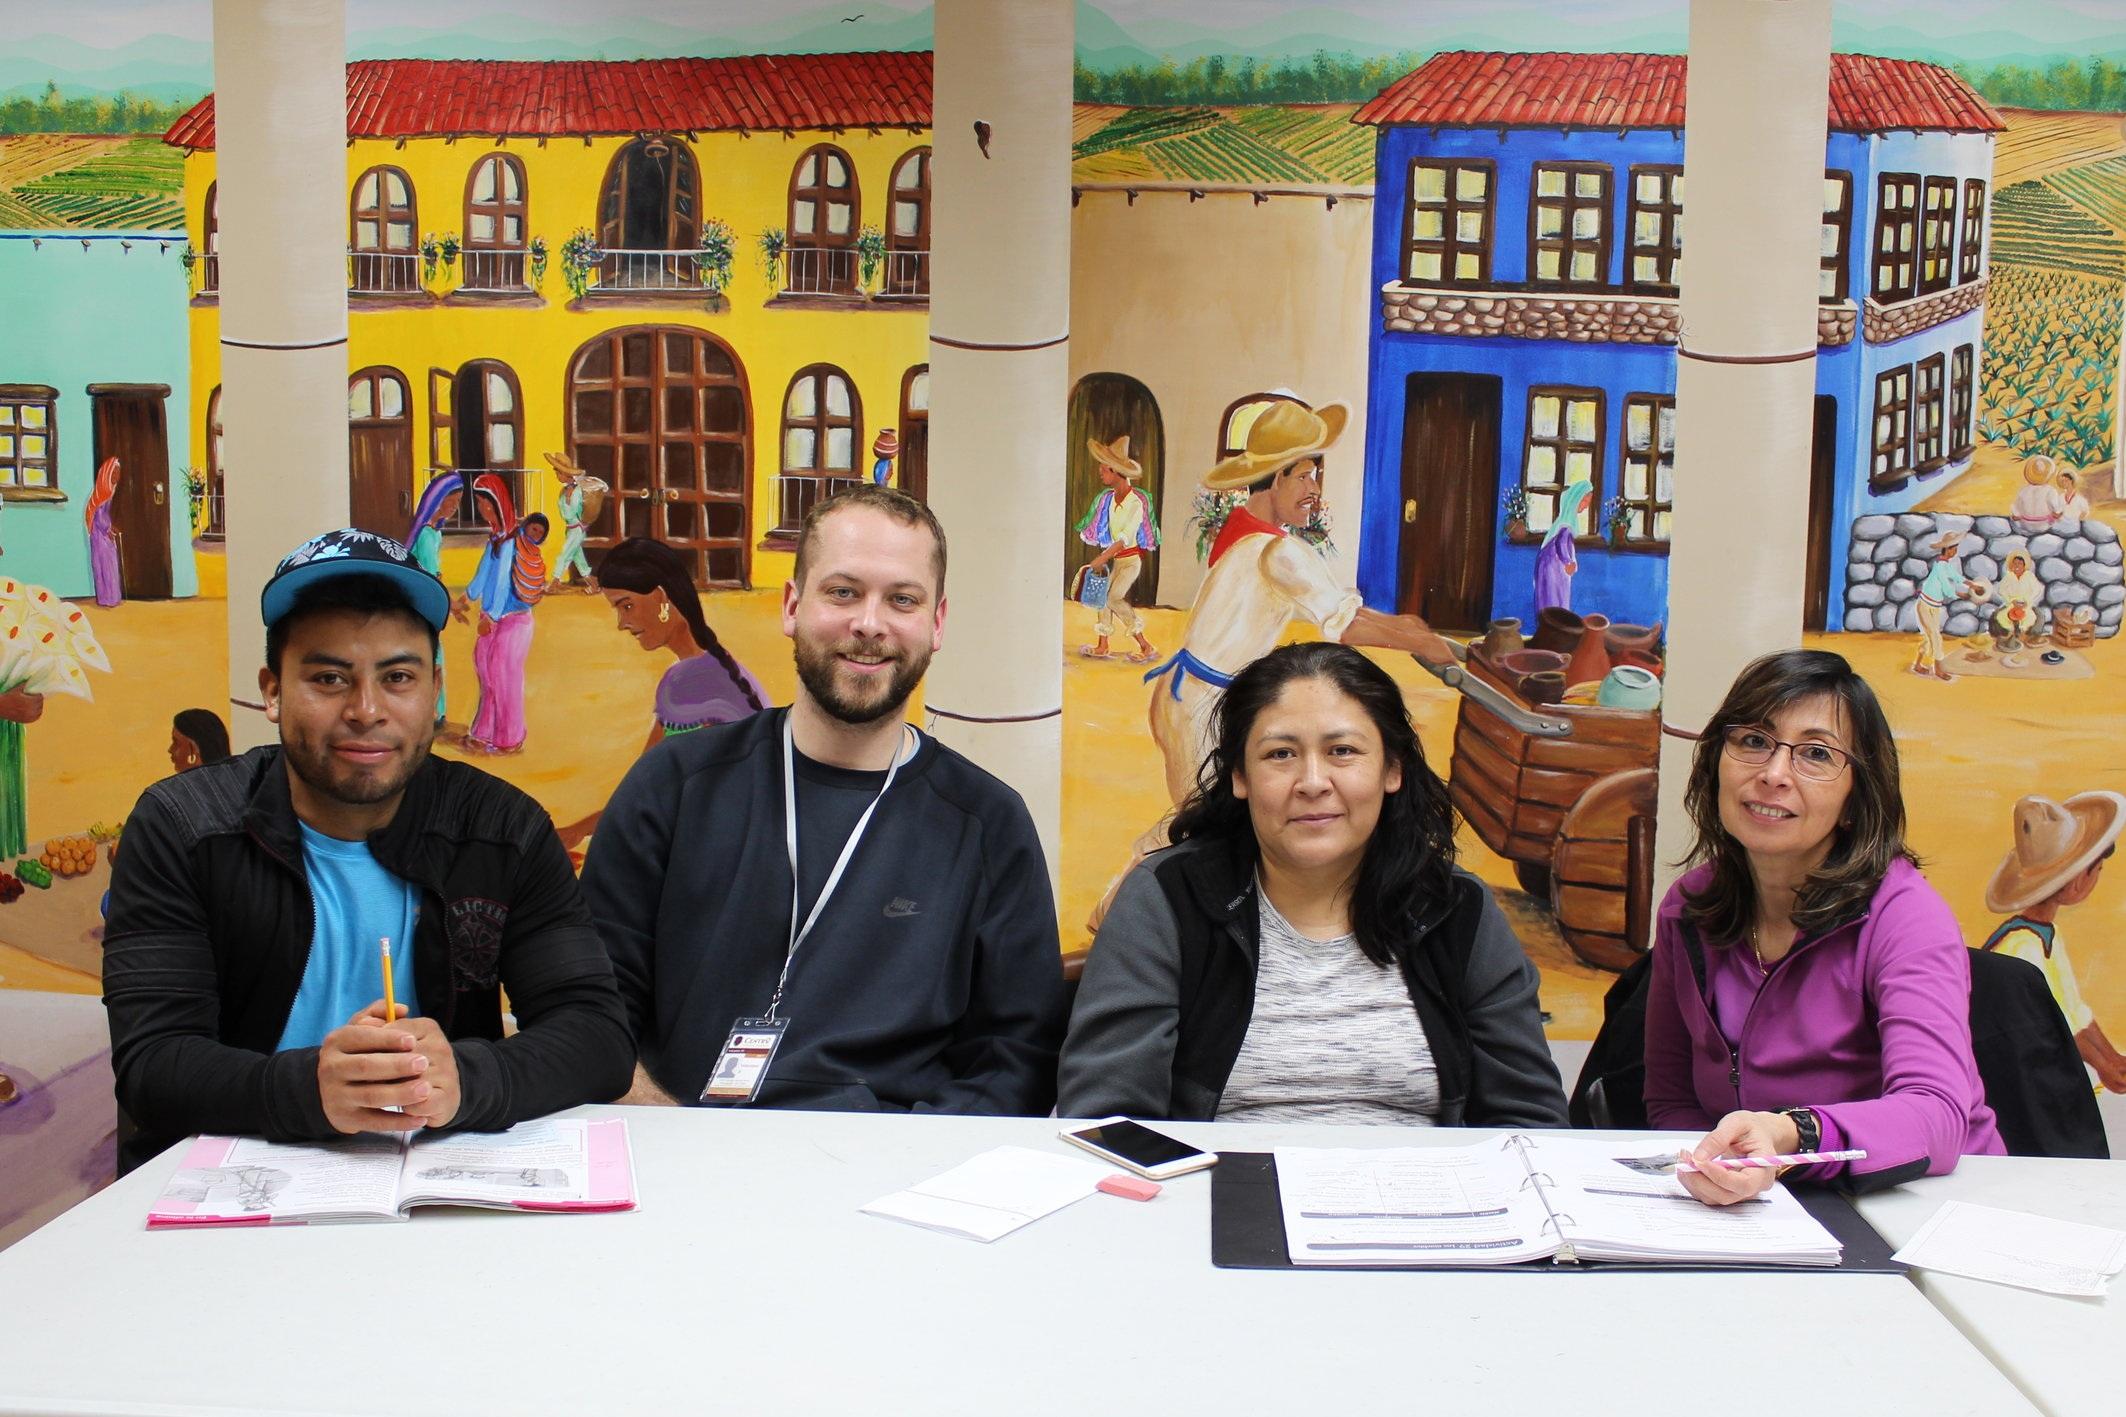 Photo caption: Adult Literacy class at Centro Tyrone Guzman.